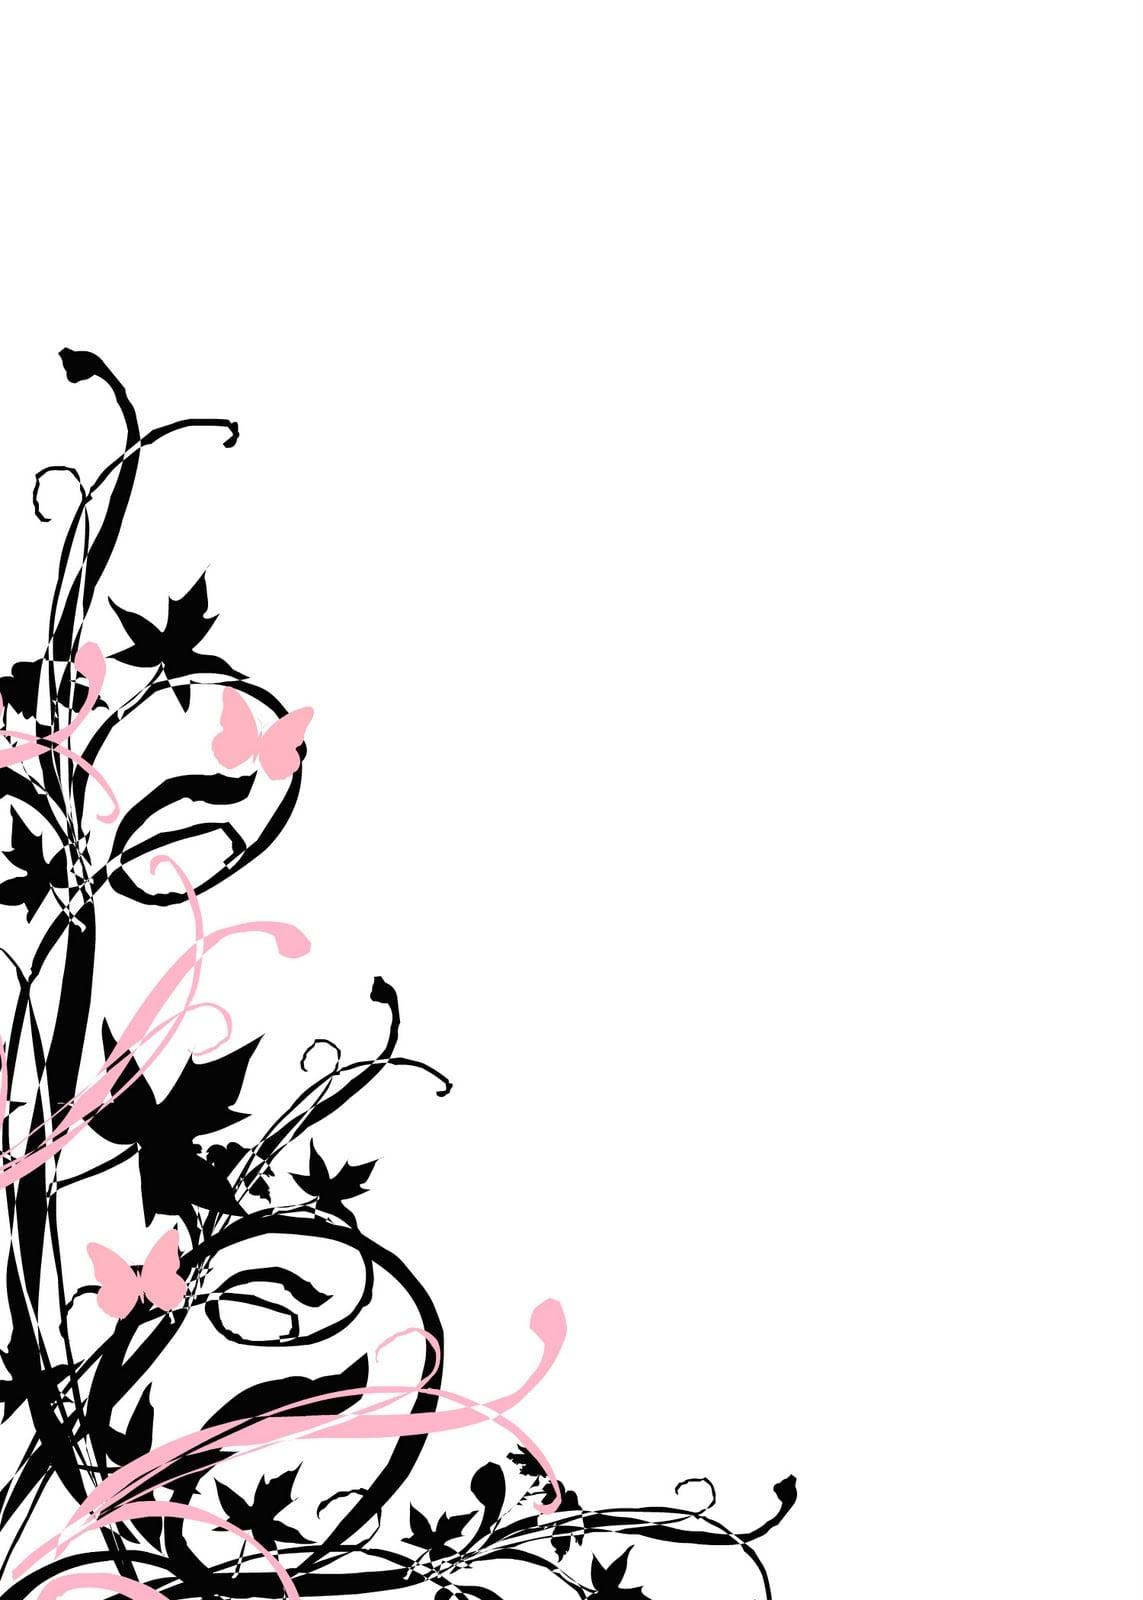 wedding_invitation_design_templates_free.jpg